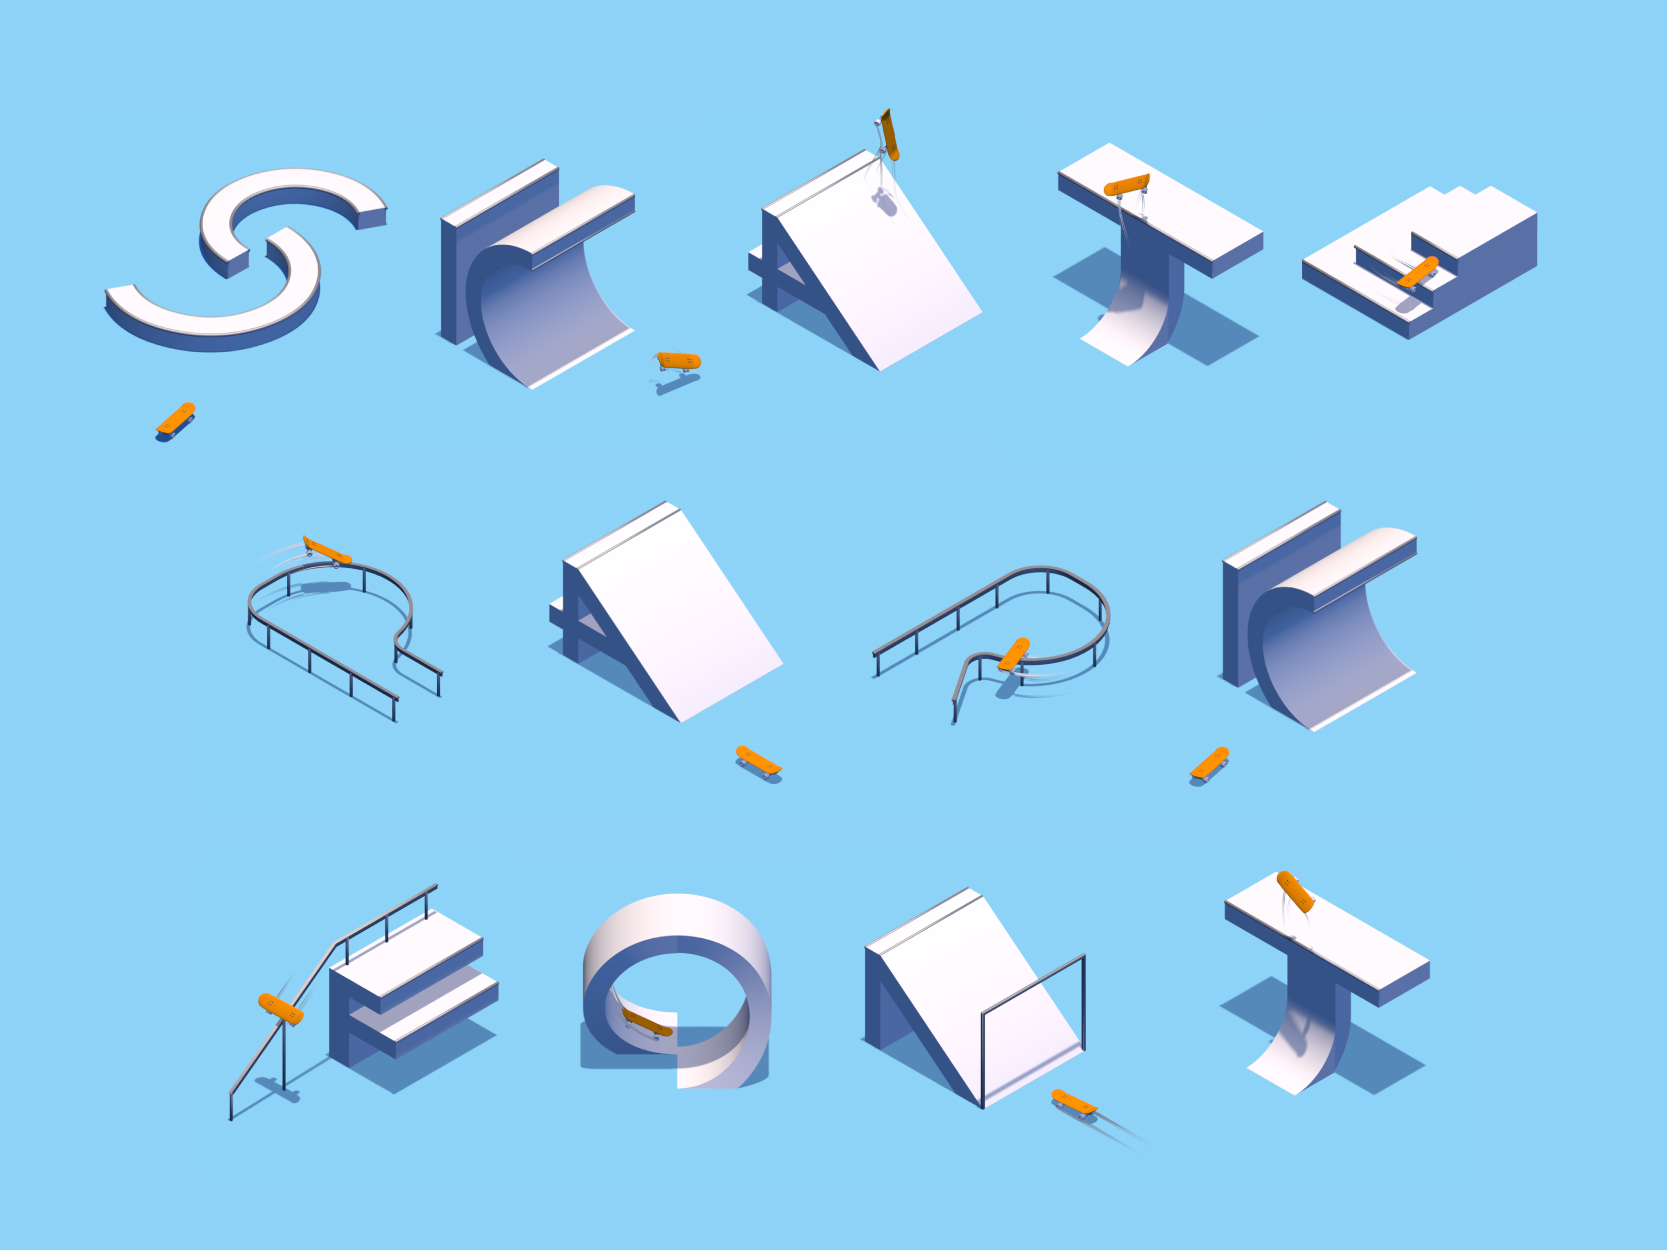 Motion Design/Typography - Skatepark